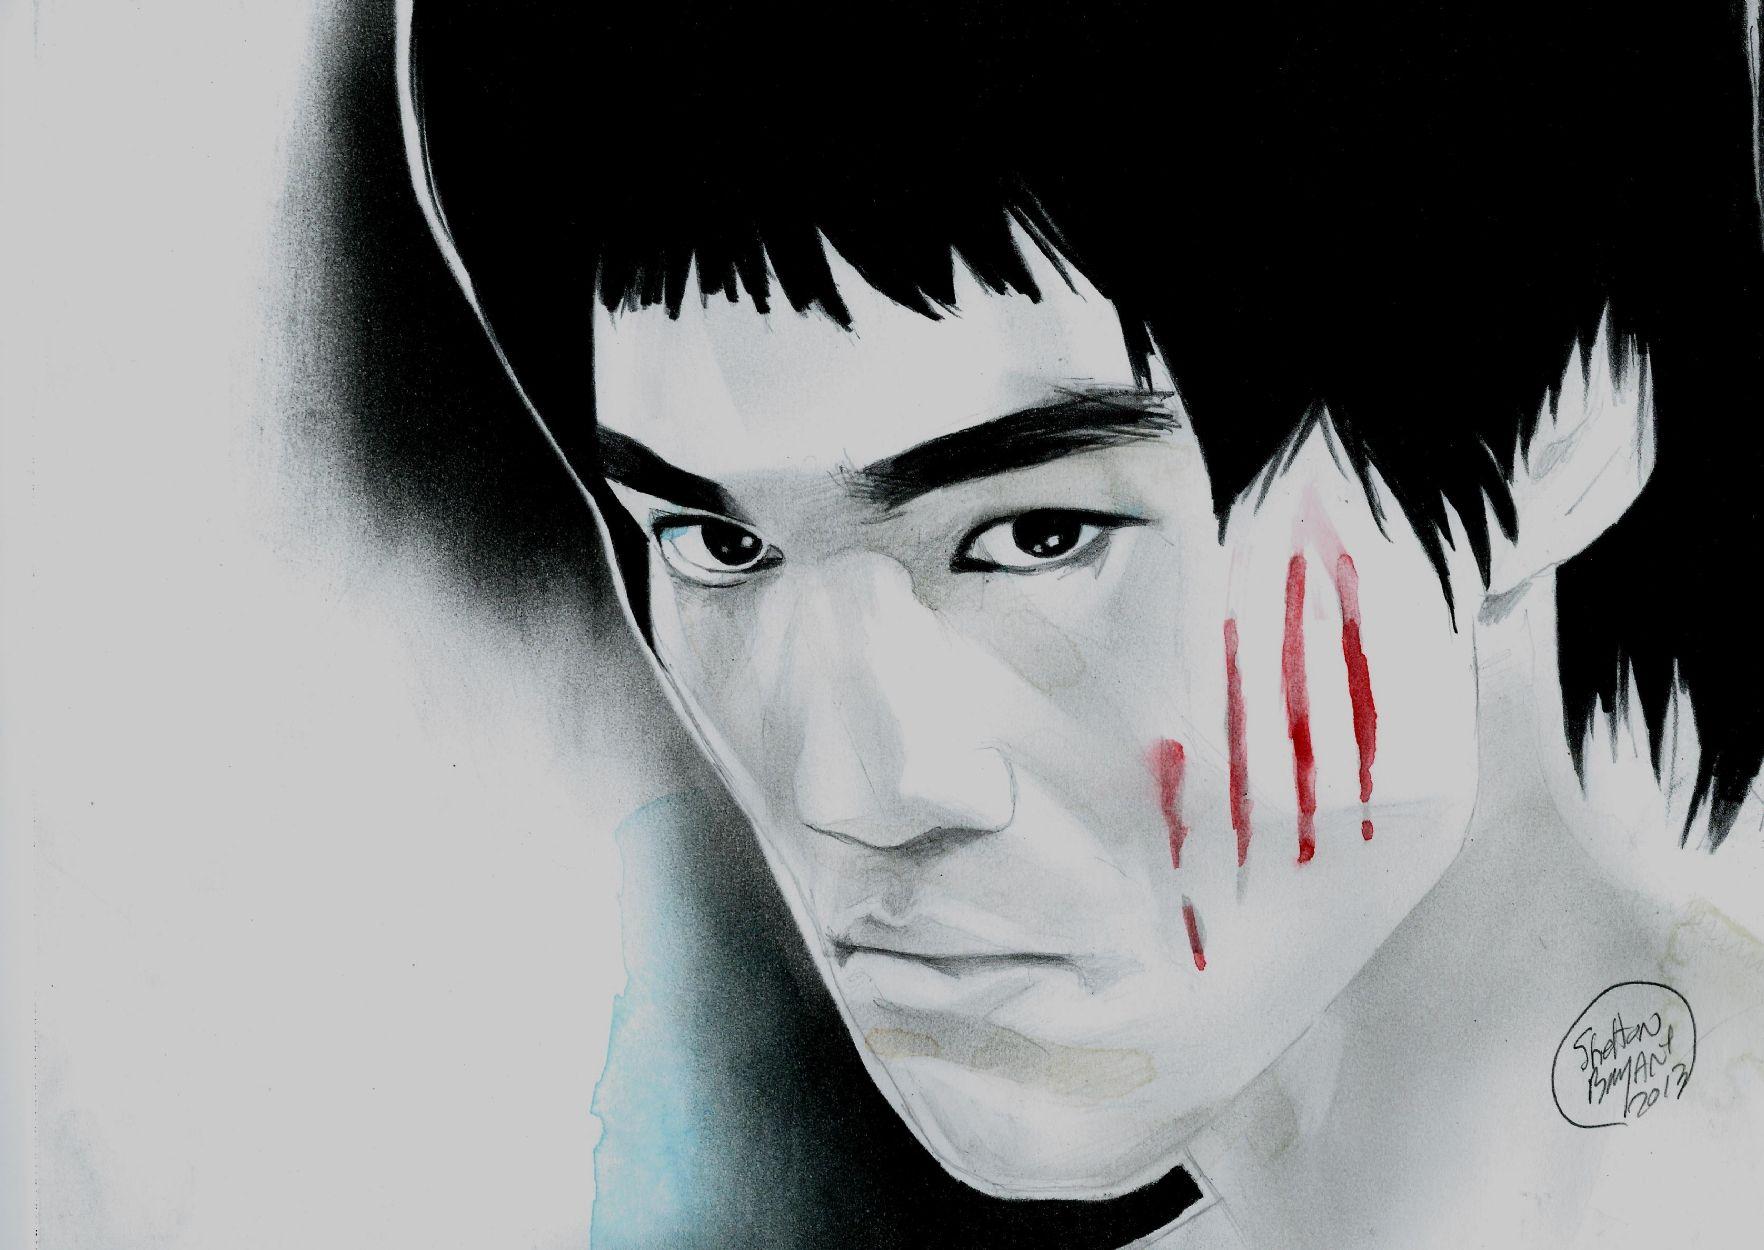 Bruce Lee by Shelton Bryant